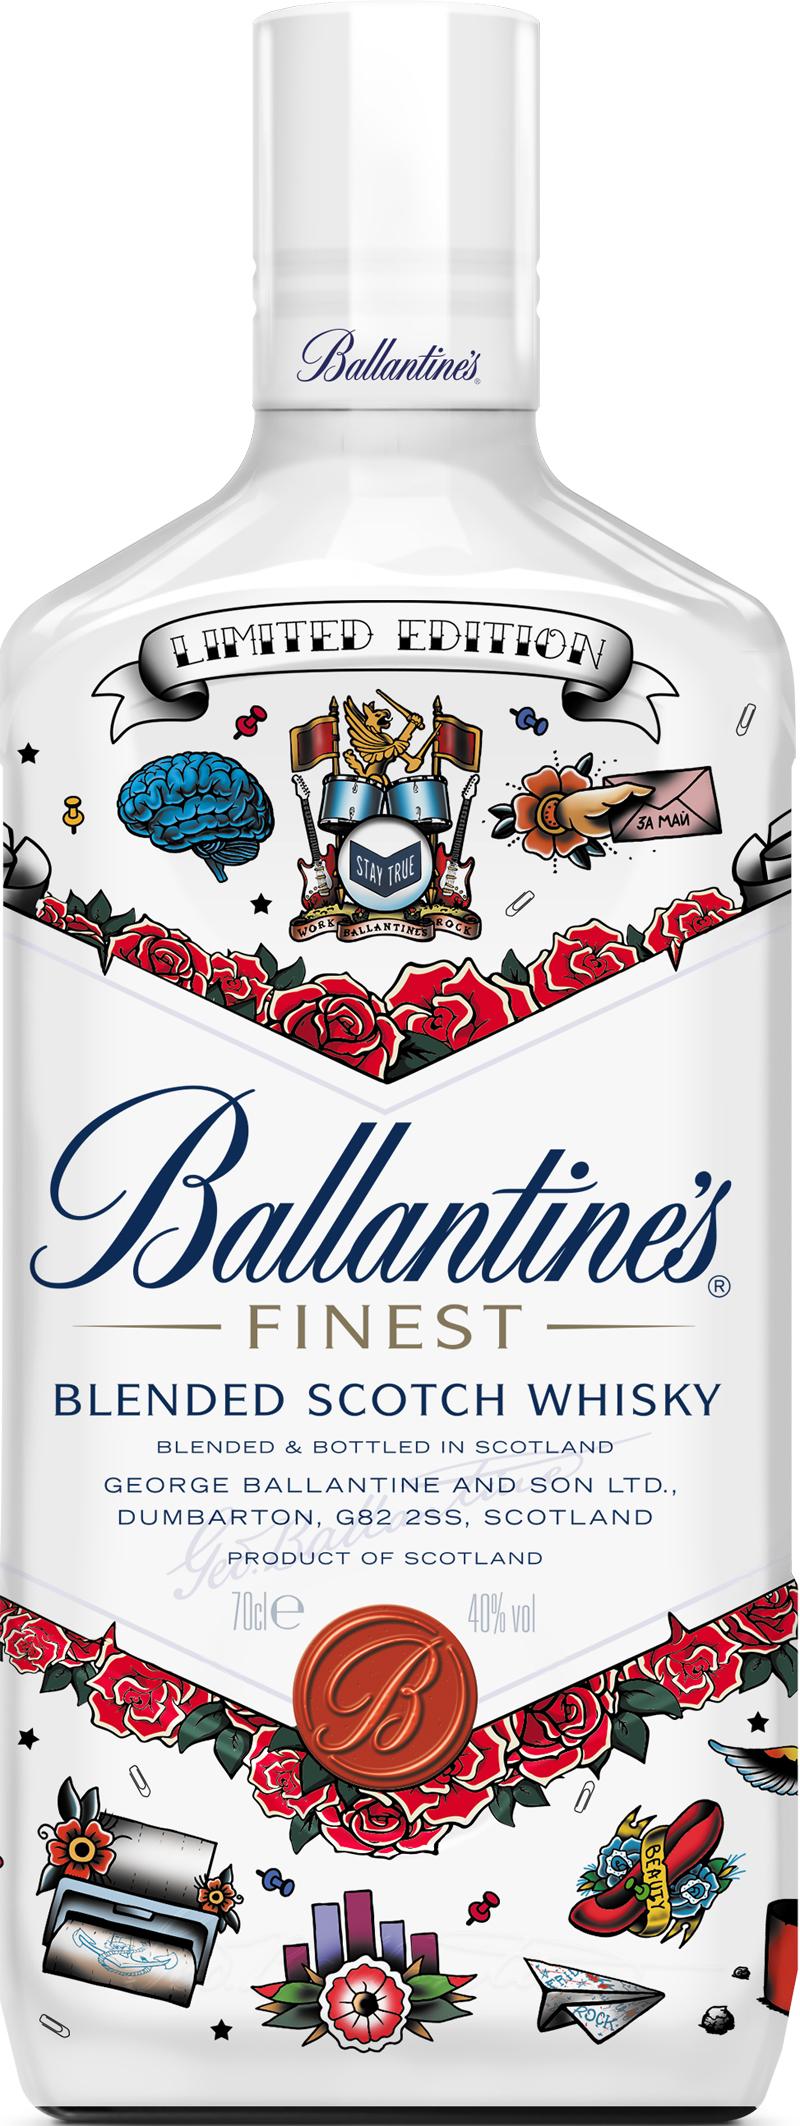 Ballantine's Tattoo Bottle копия 1 - Виски для скрытых рокеров